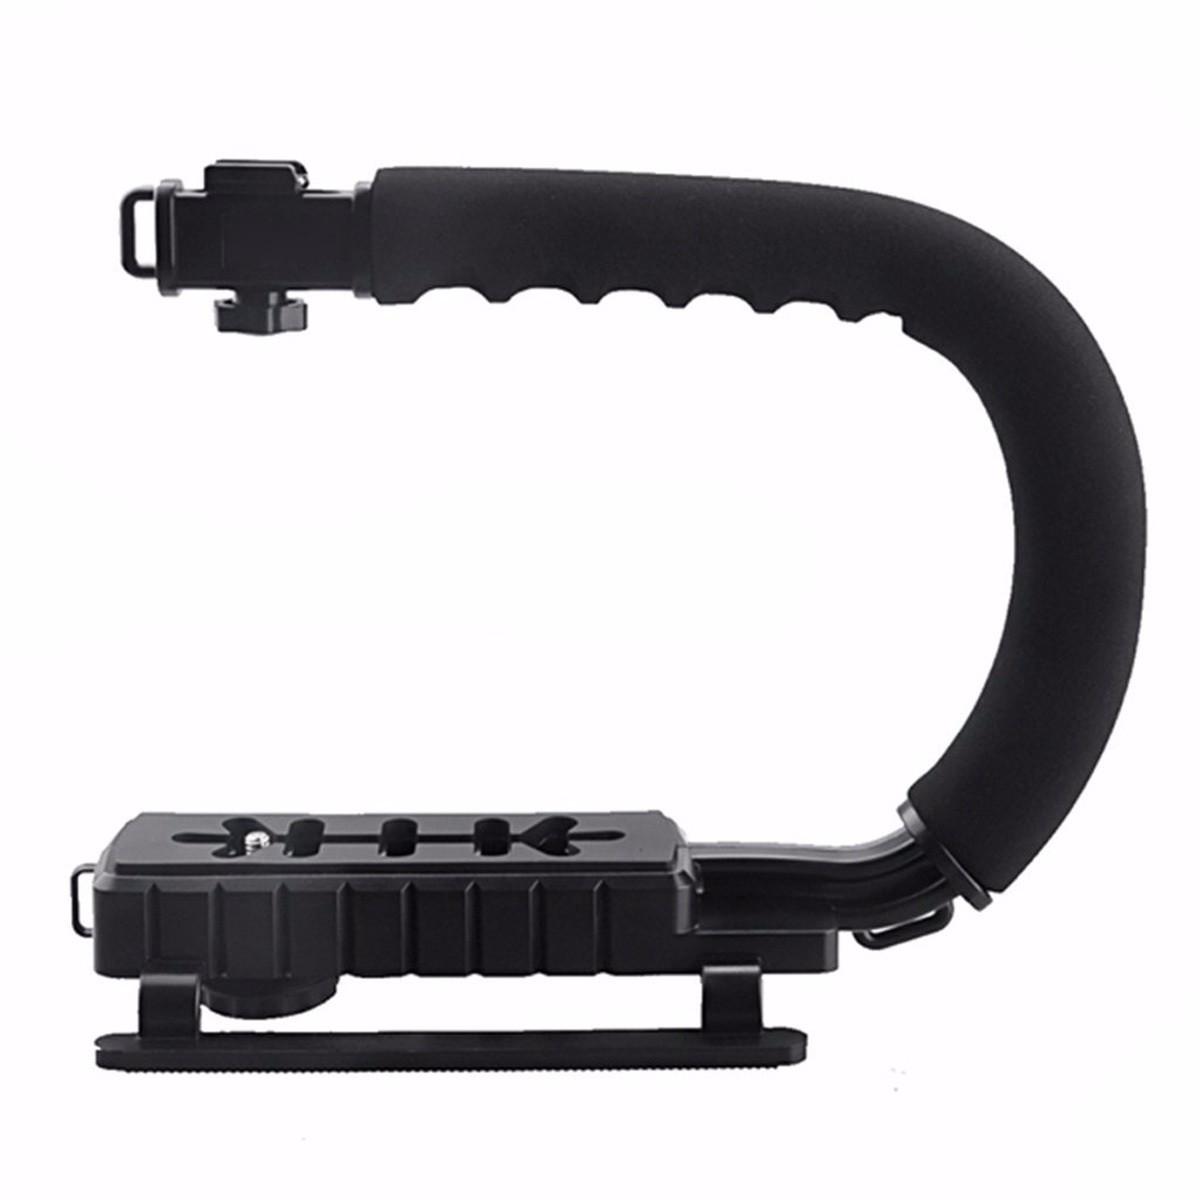 Pro Video Stabilizing Handle Grip for Kodak EasyShare V1253 Vertical Shoe Mount Stabilizer Handle